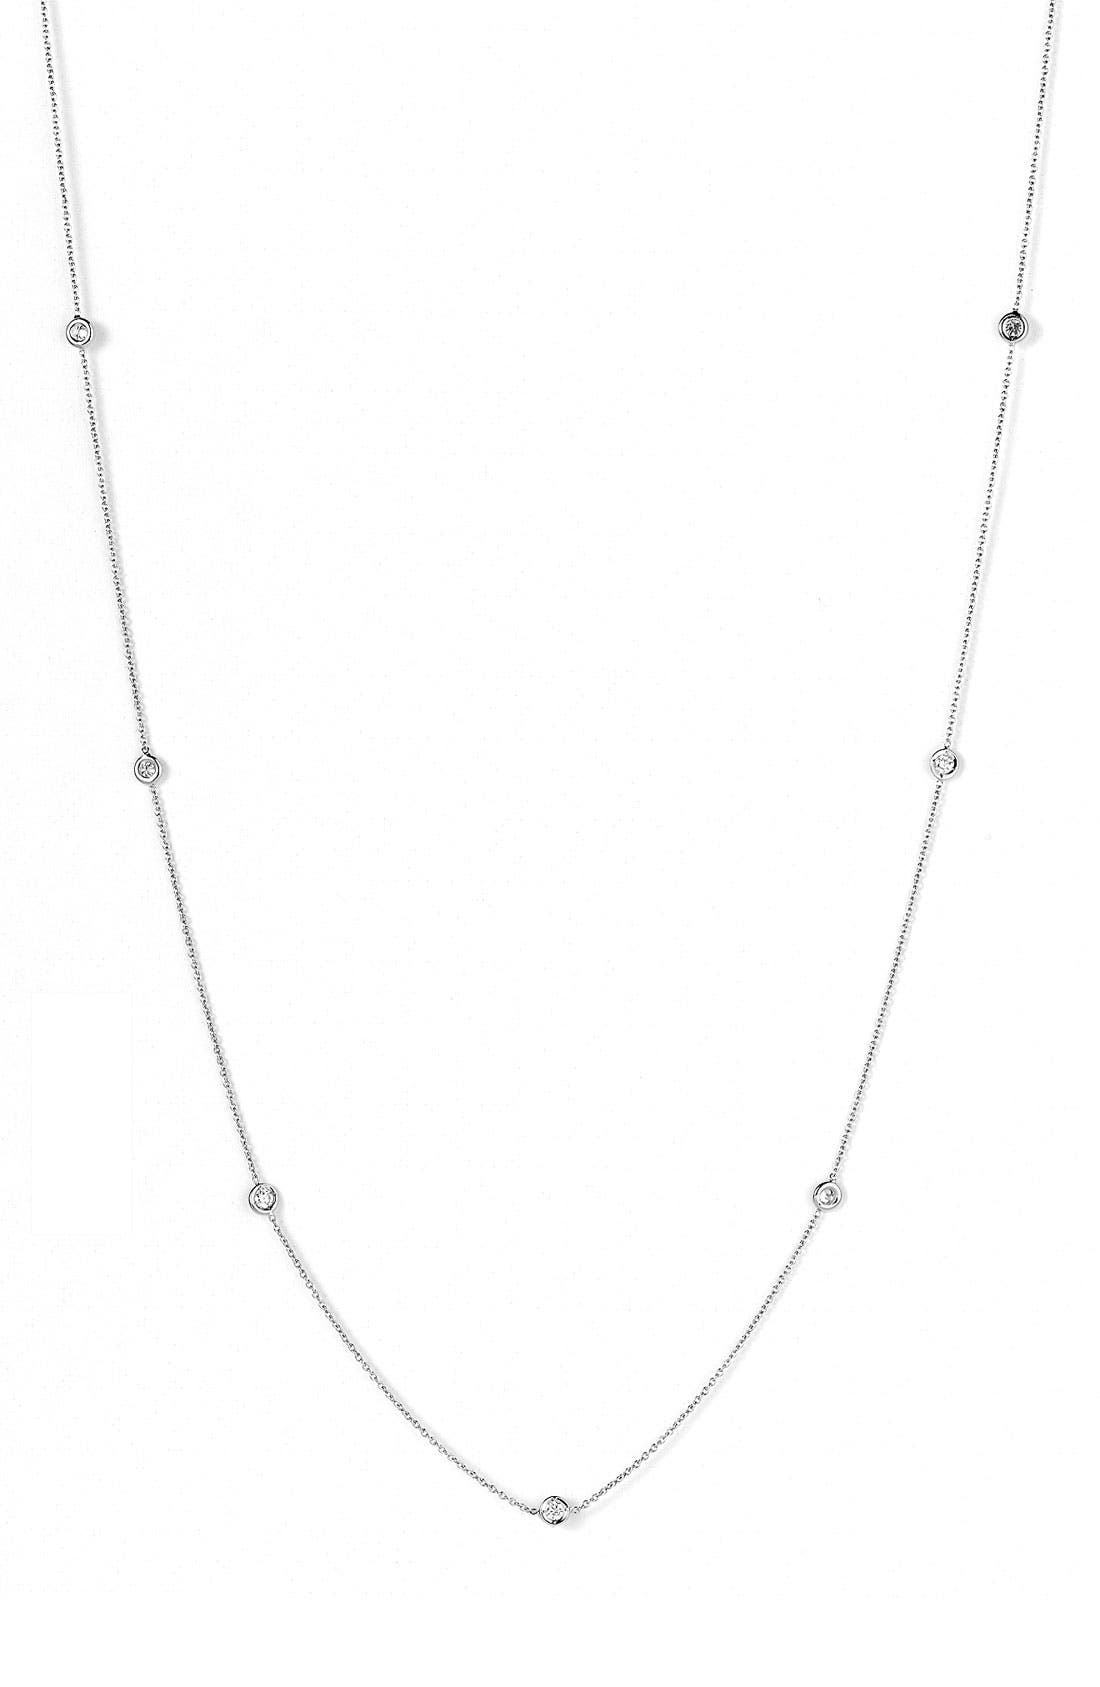 Diamond Station Necklace,                             Alternate thumbnail 6, color,